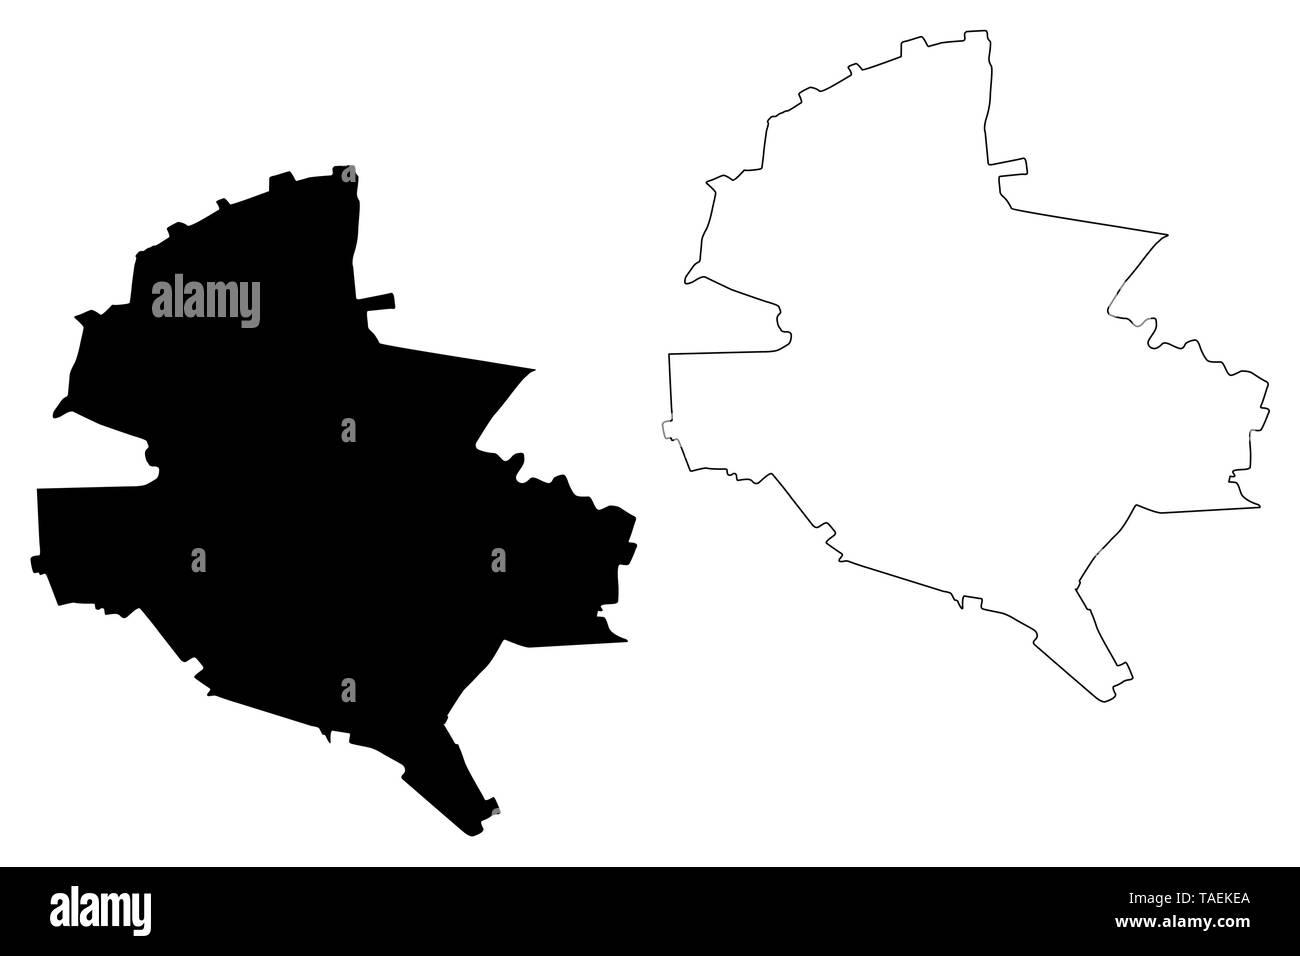 Bucharest County (Administrative divisions of Romania, Bucuresti - Ilfov development region) map vector illustration, scribble sketch Bucharest map - Stock Image